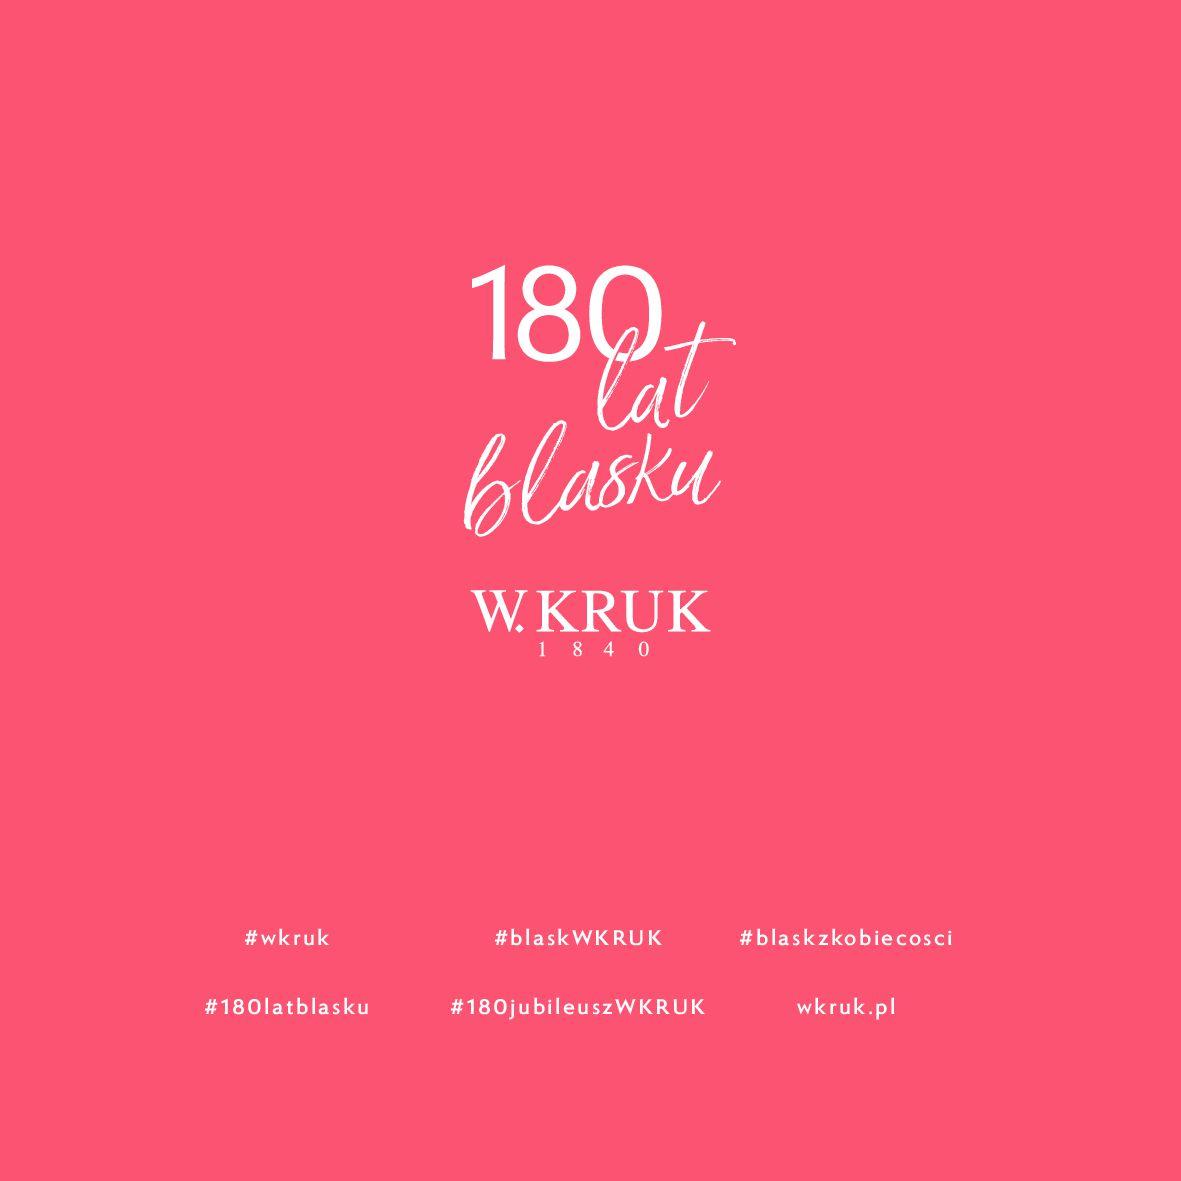 Gazetka W. KRUK: Katalog - Kolekcja Blask 2021-02-17 page-66